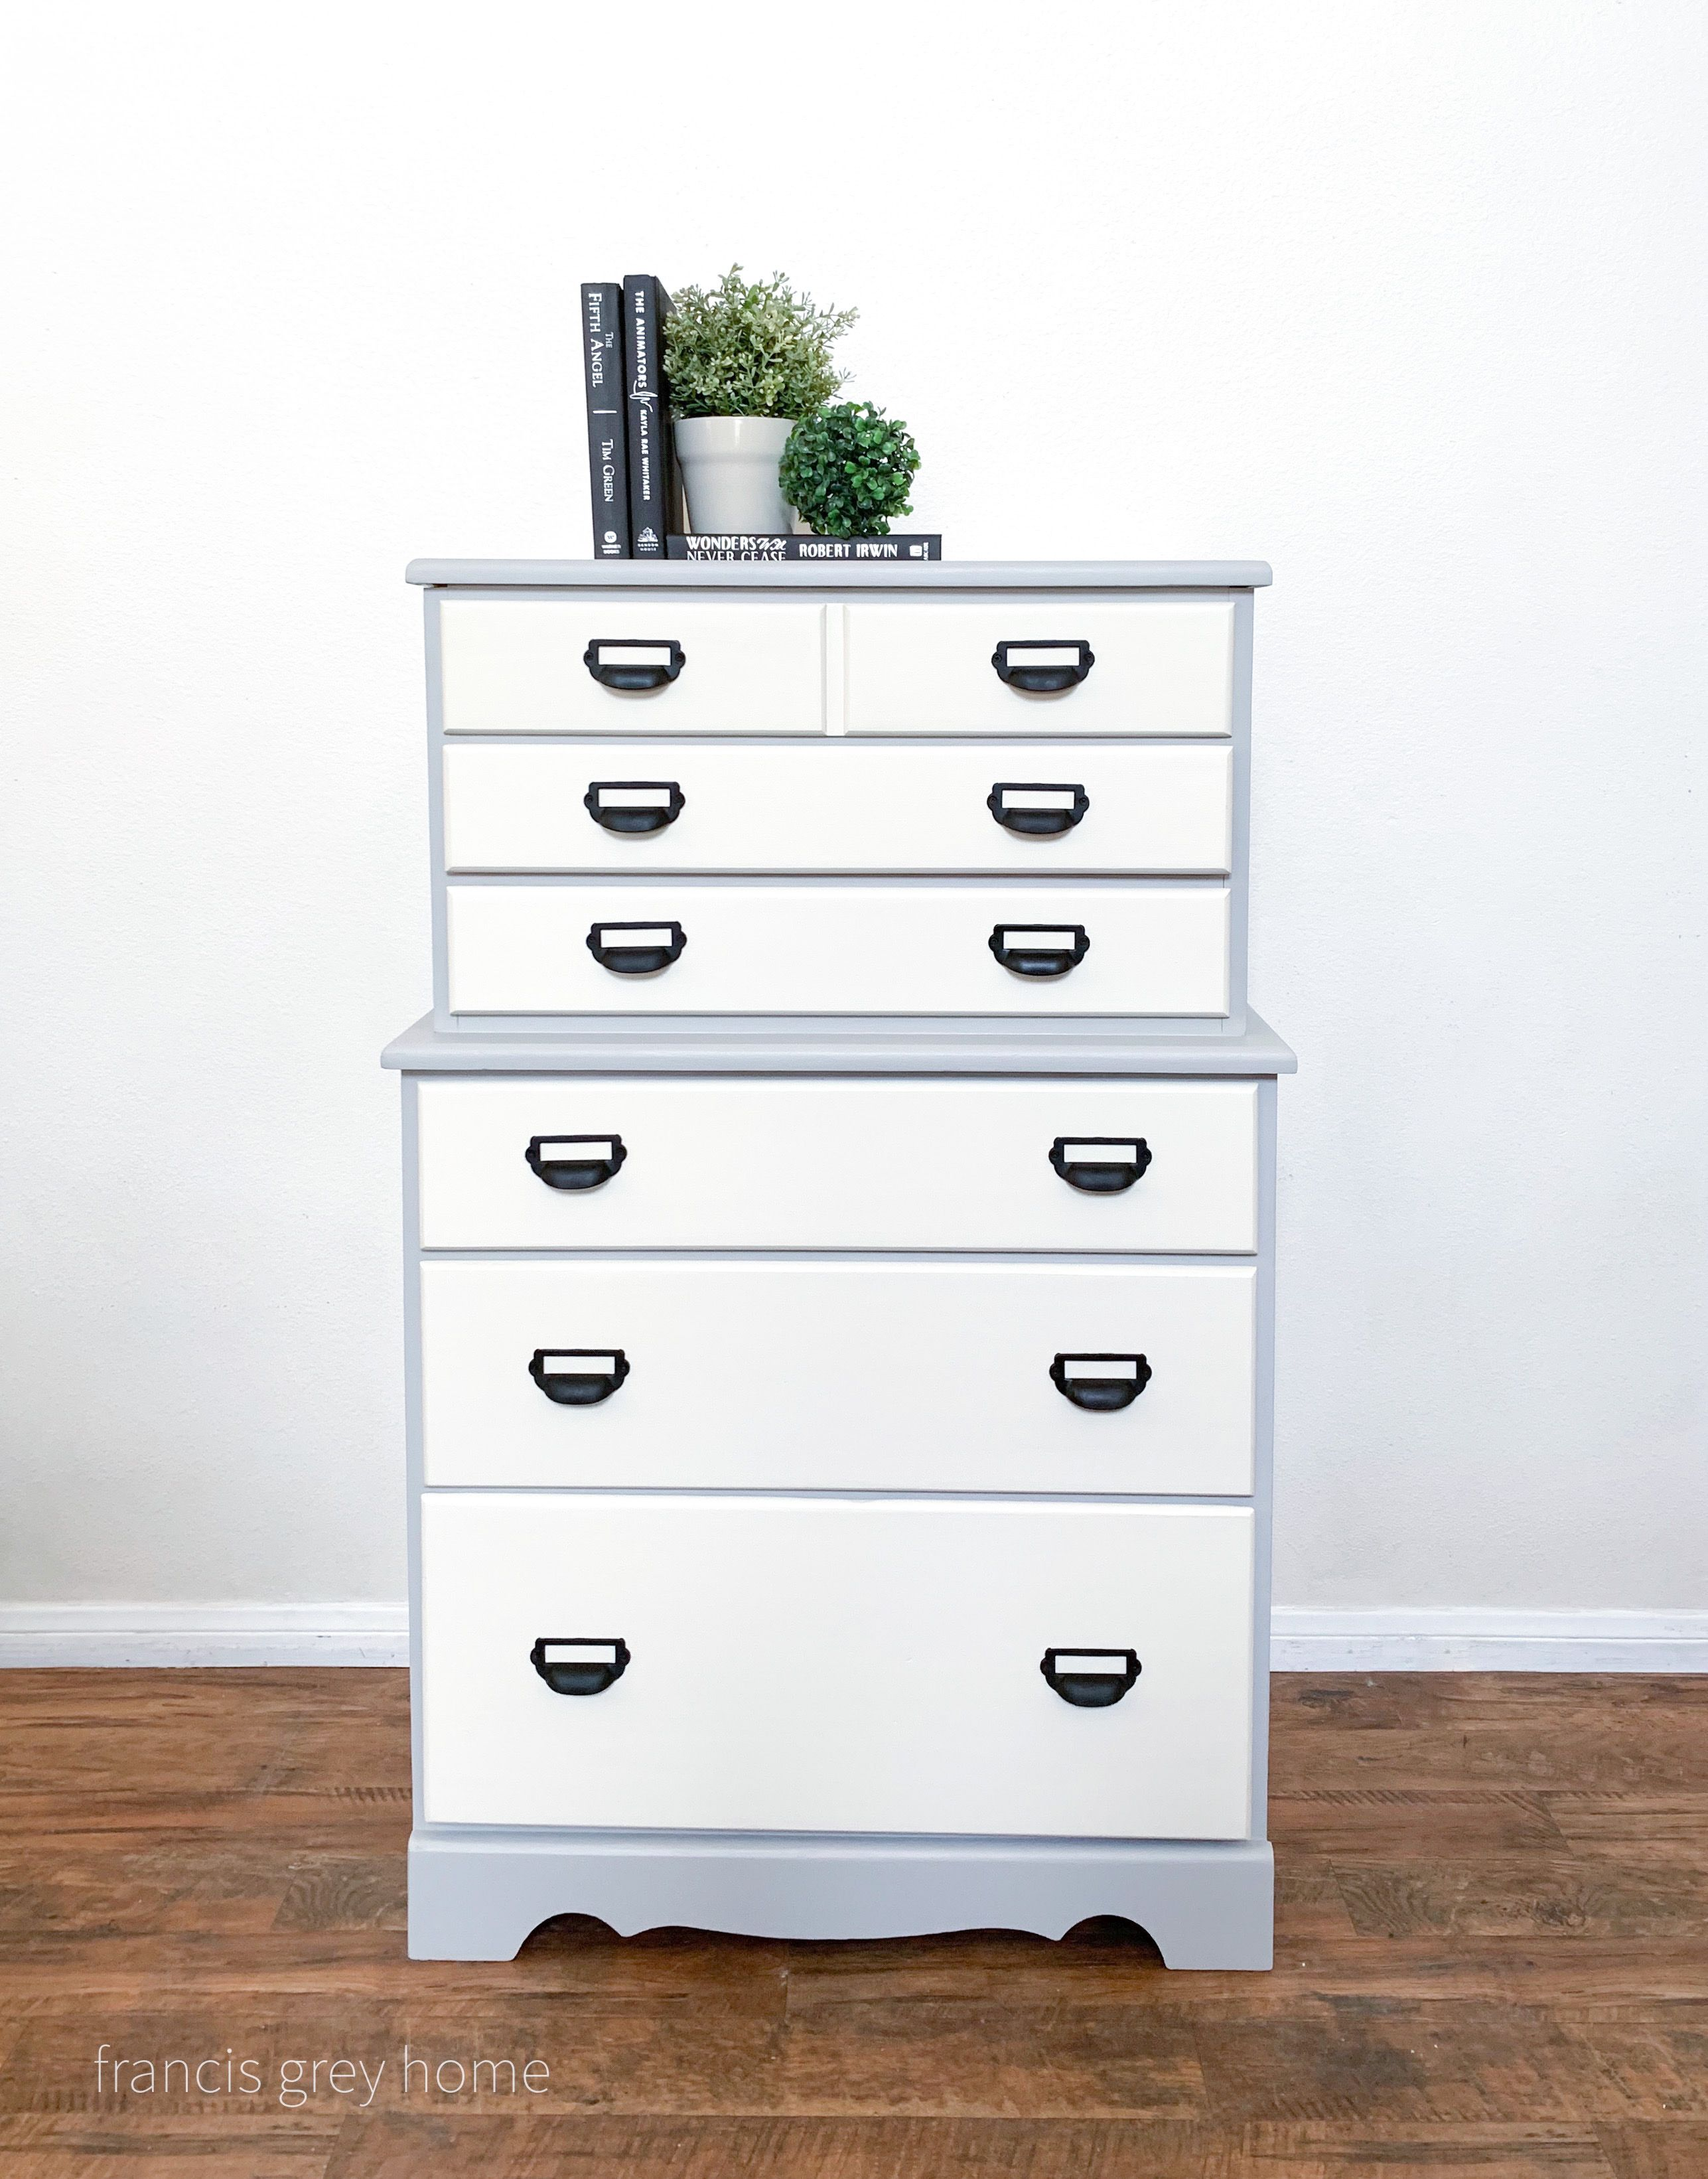 Grey And White Dresser White Dresser Grey And White Home Decor [ 3283 x 2574 Pixel ]